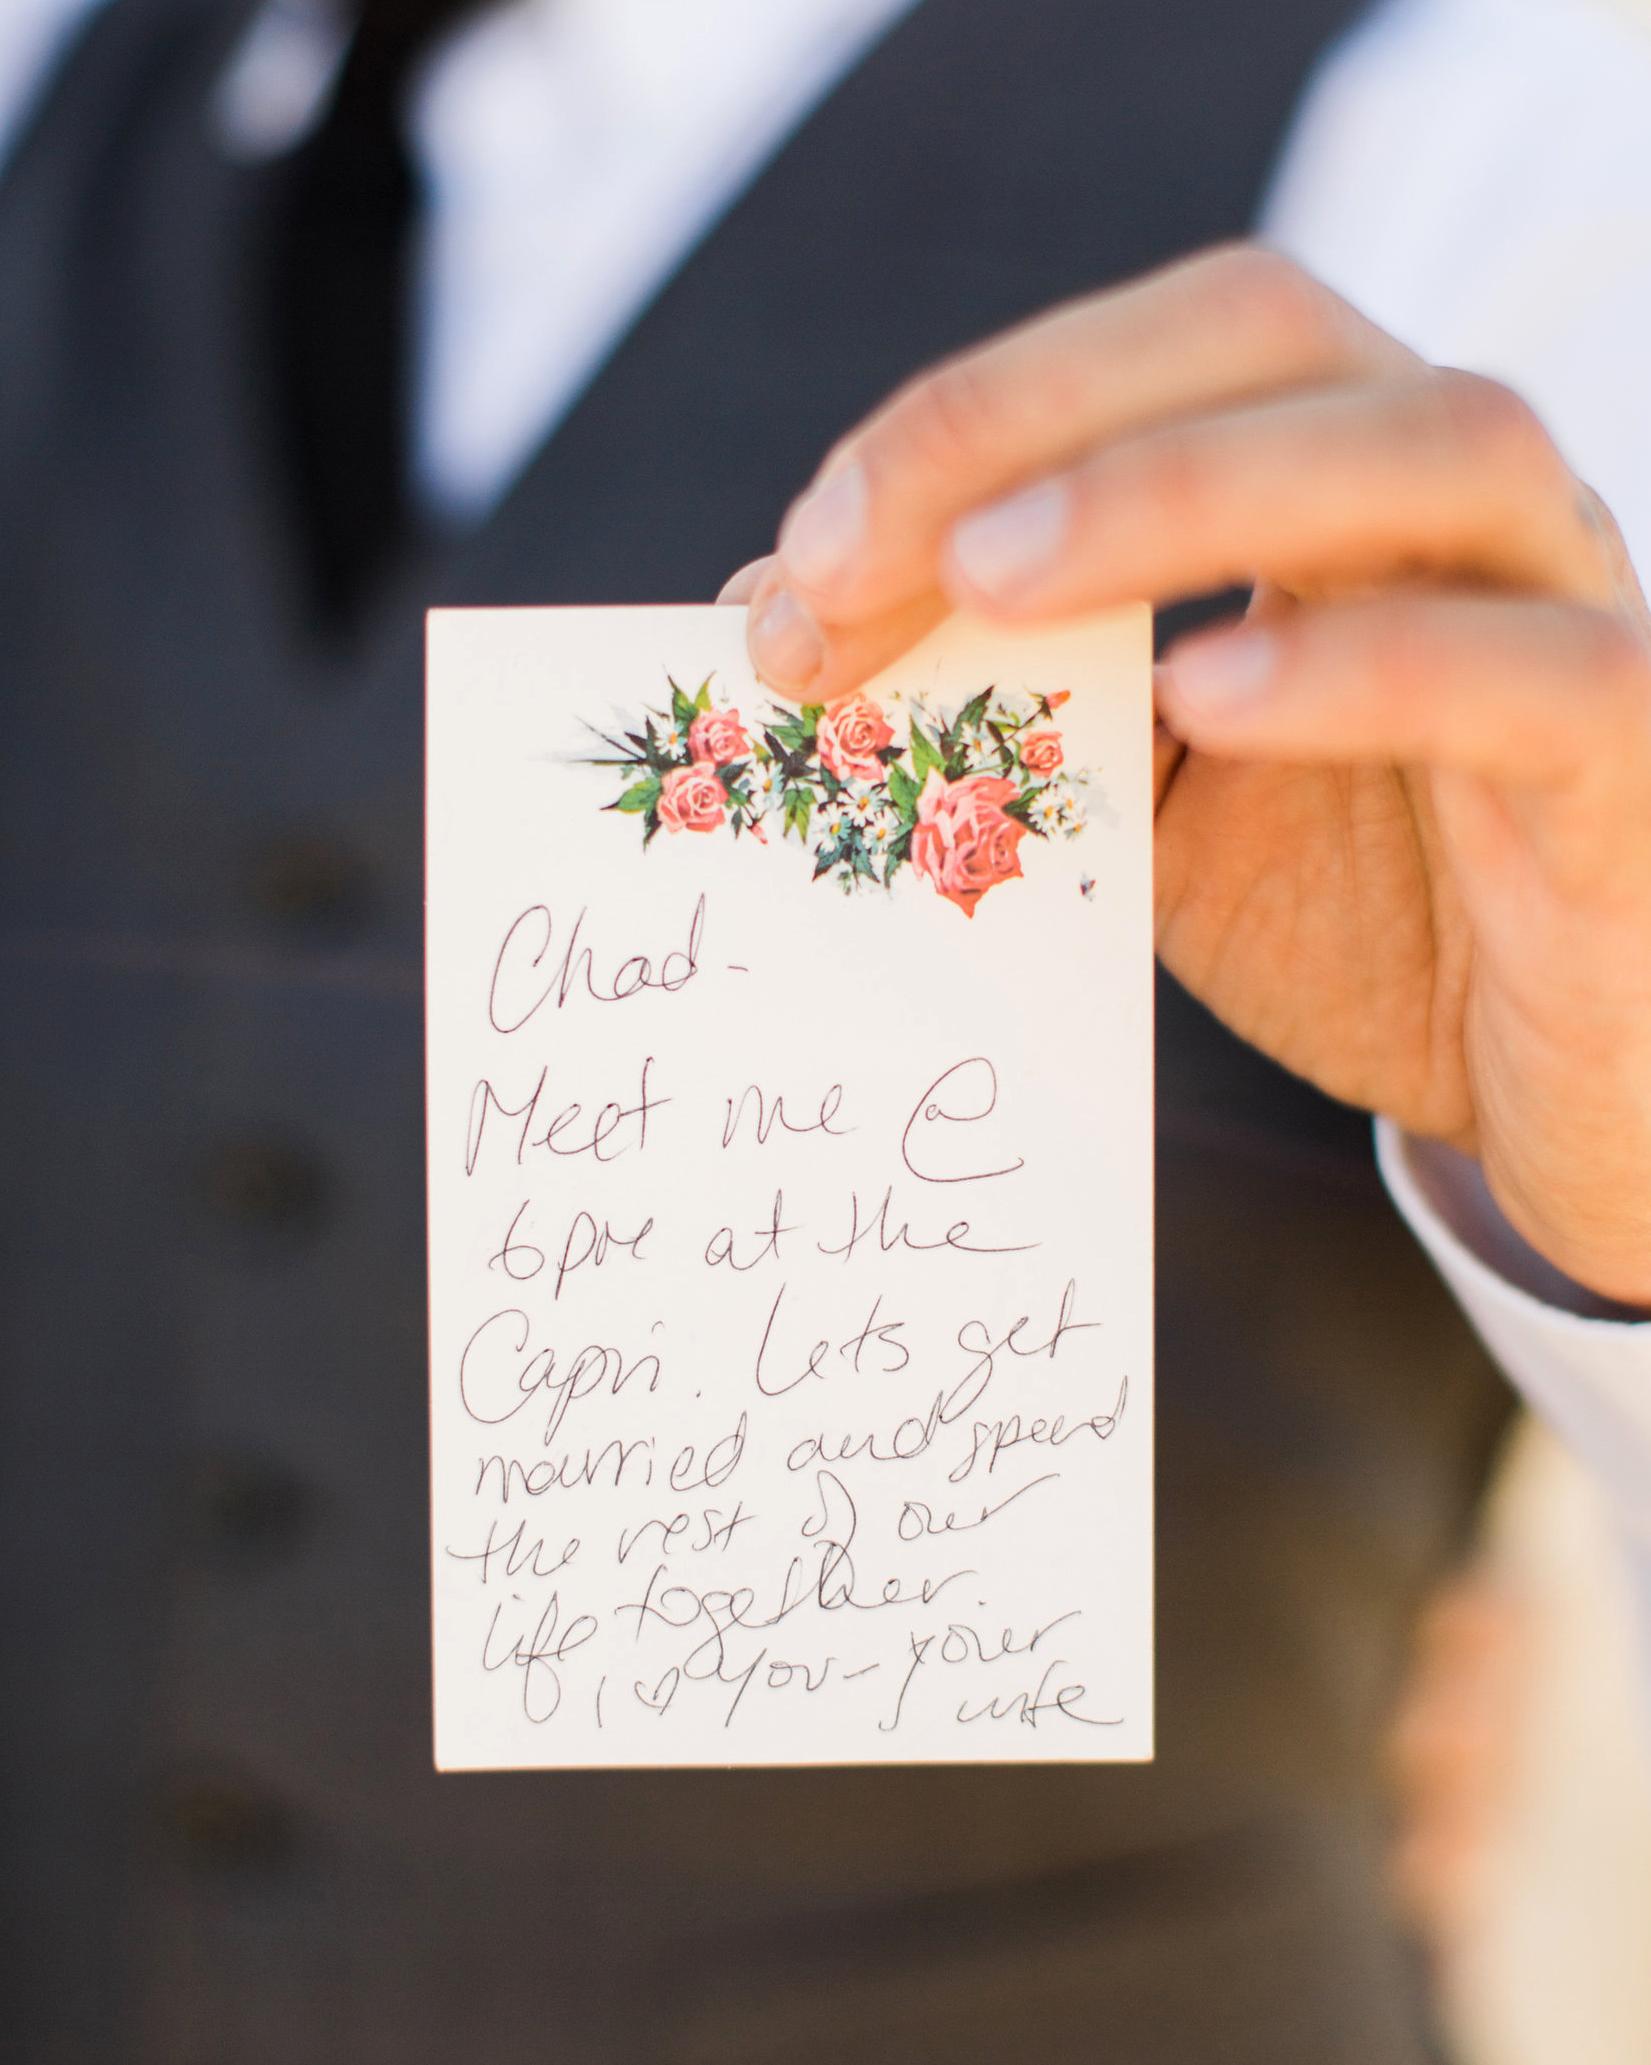 lara-chad-wedding-note-136-s112306-1115.jpg